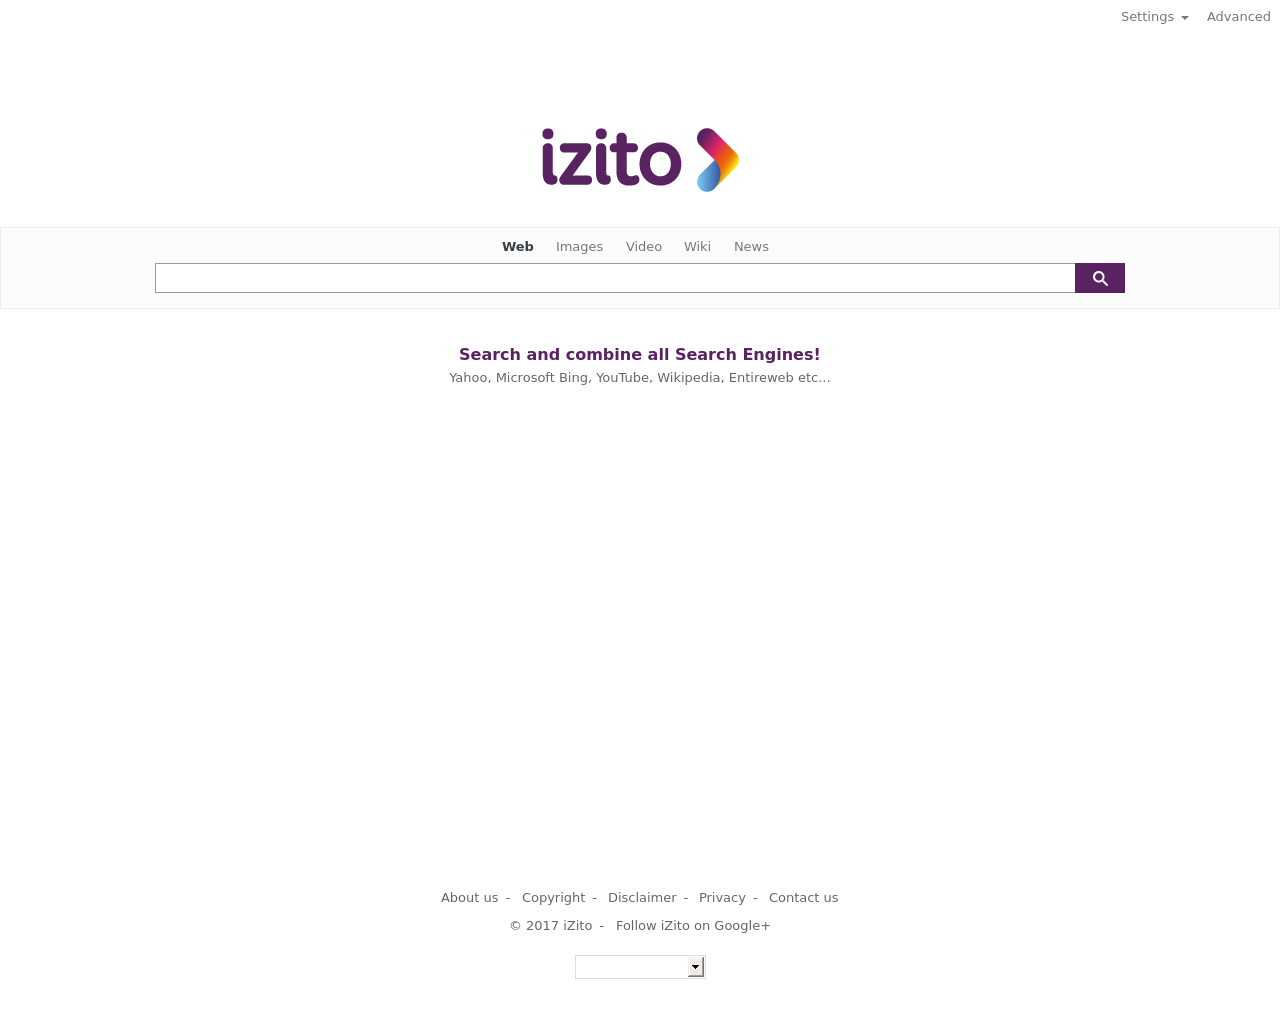 iZito-Advertising-Reviews-Pricing